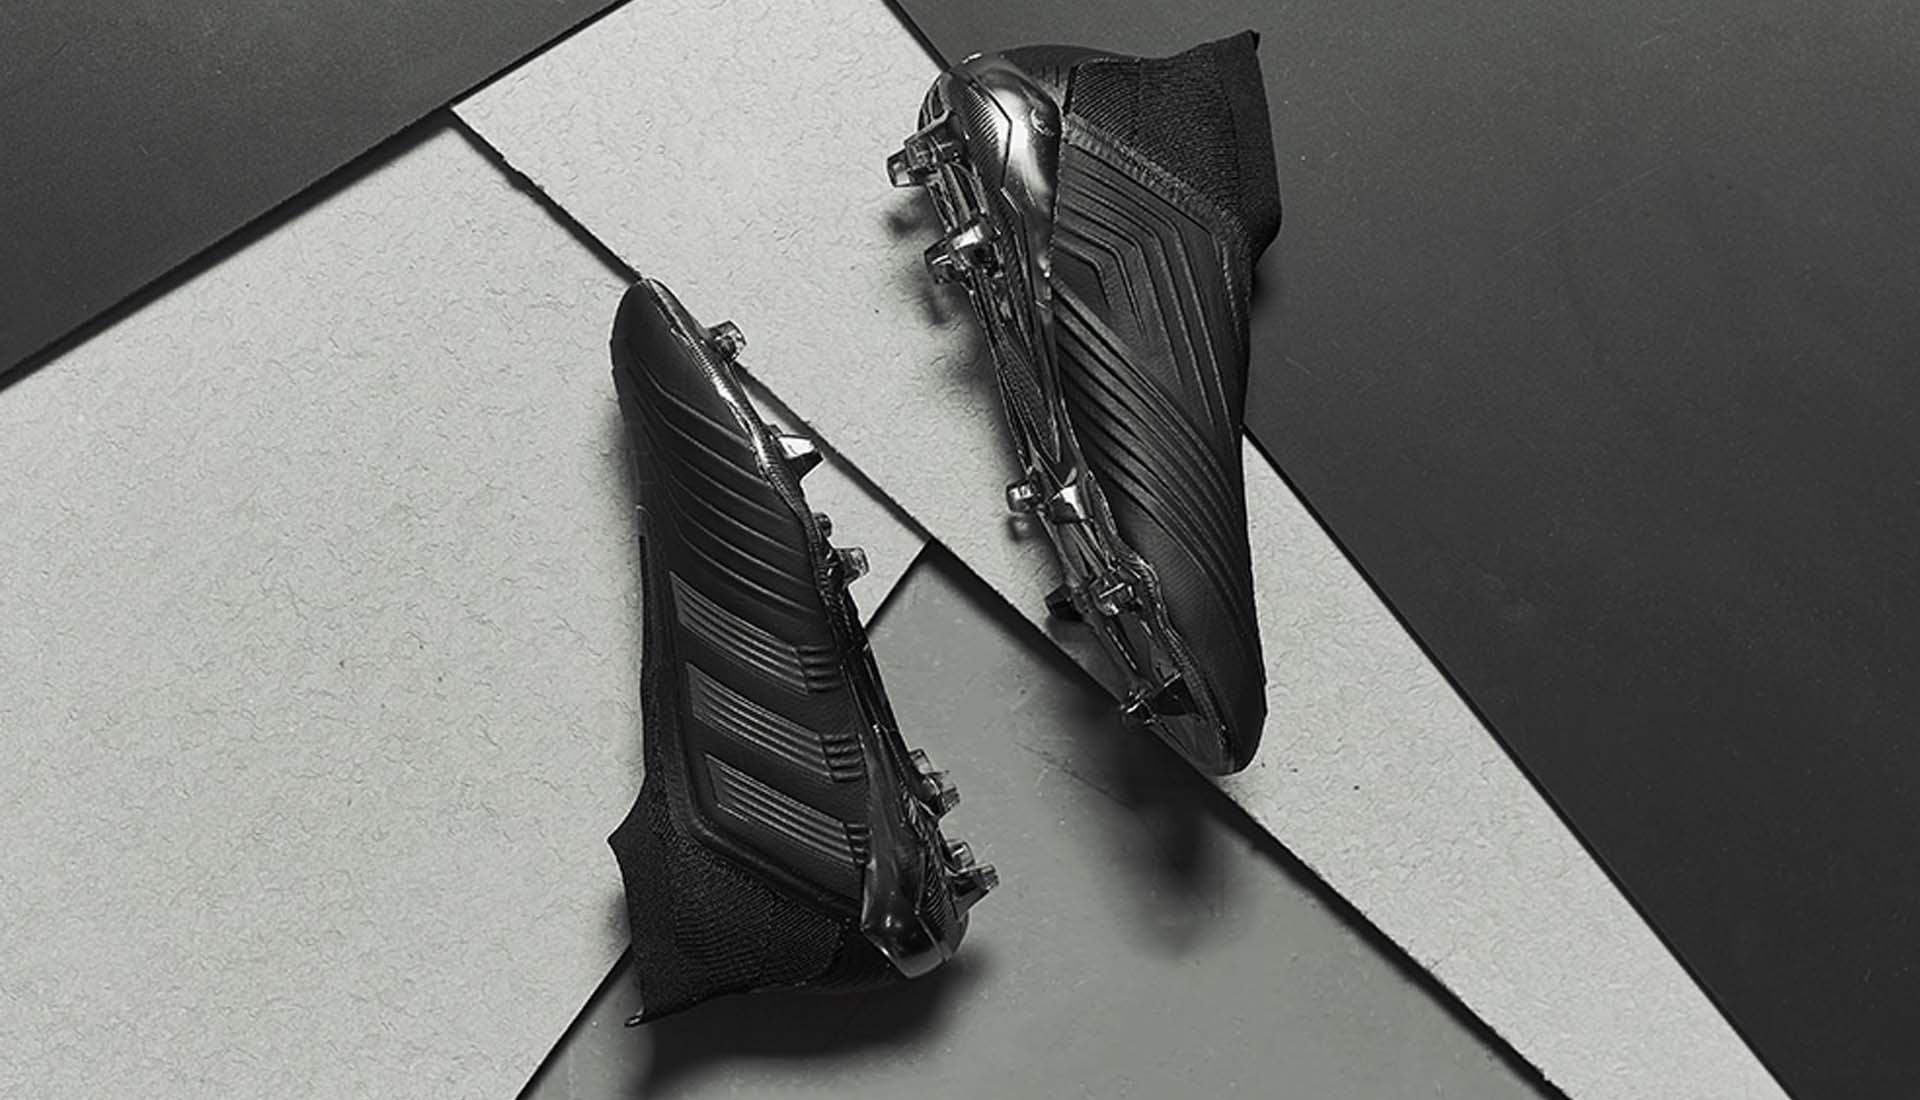 chaussures-football-adidas-Predator-18-Nite-Crawler-img1